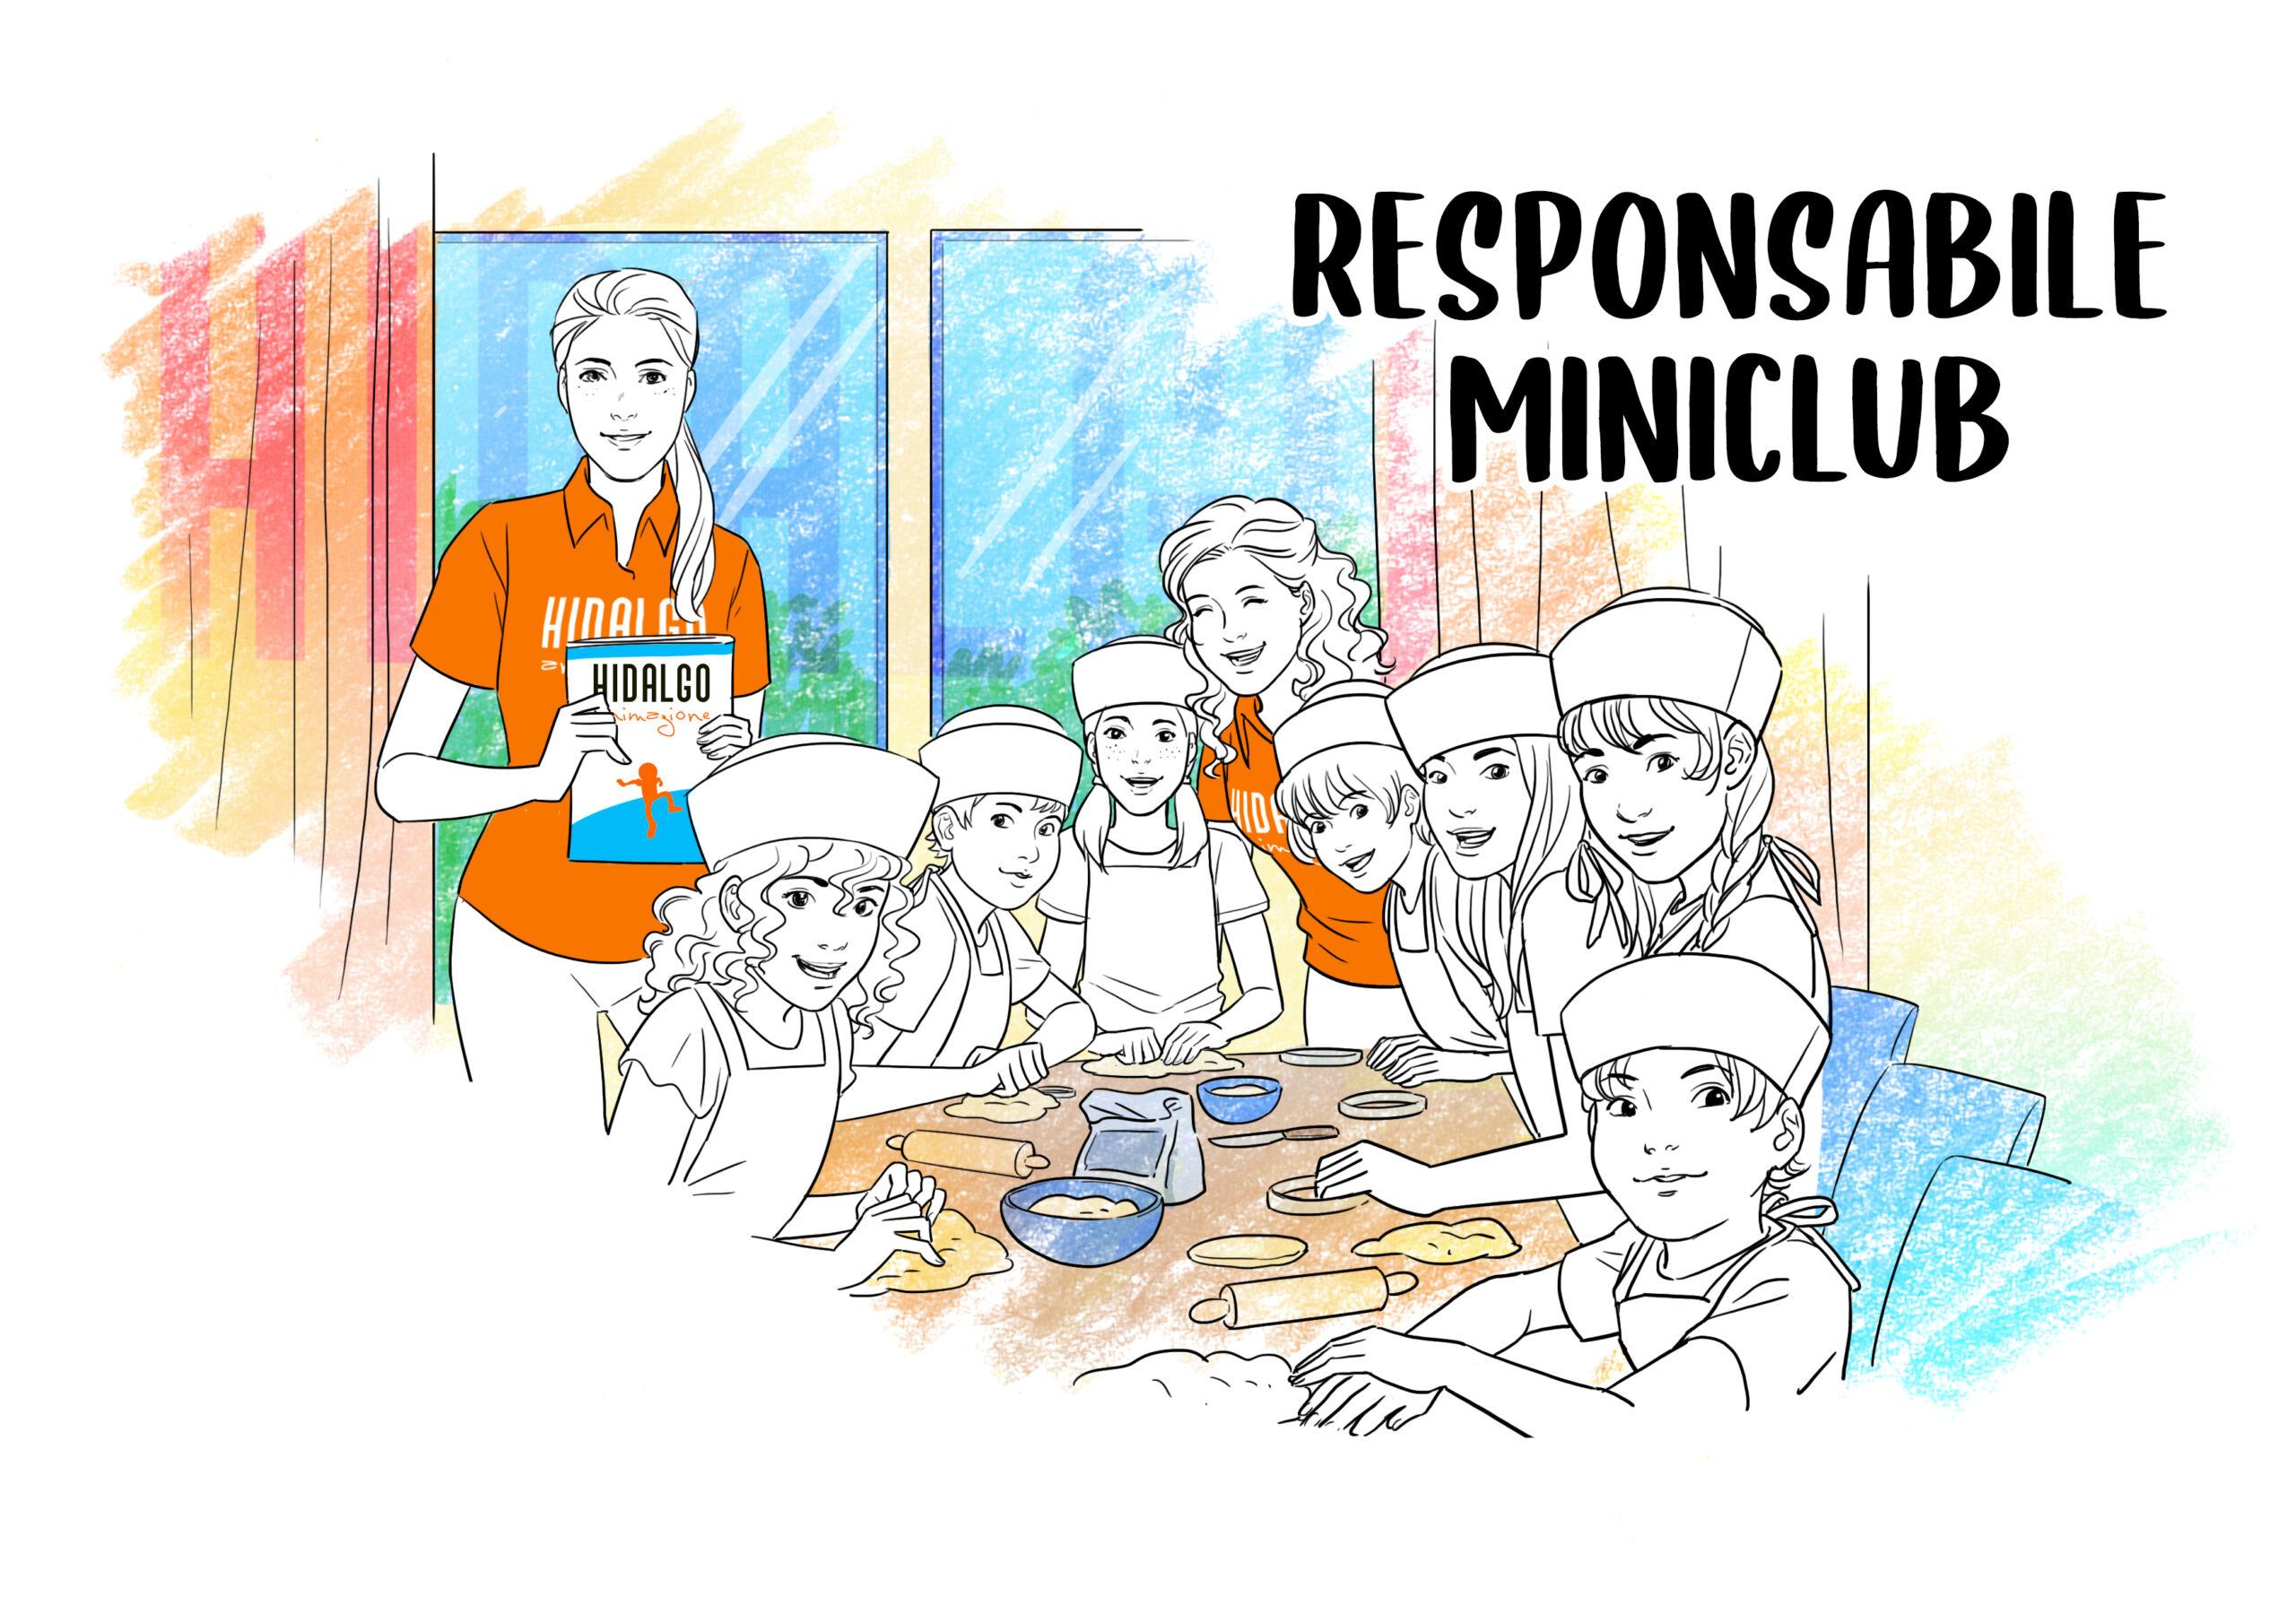 https://www.hidalgoanimazione.it/wp-content/uploads/2020/04/responsabile-miniclub-scaled.jpg